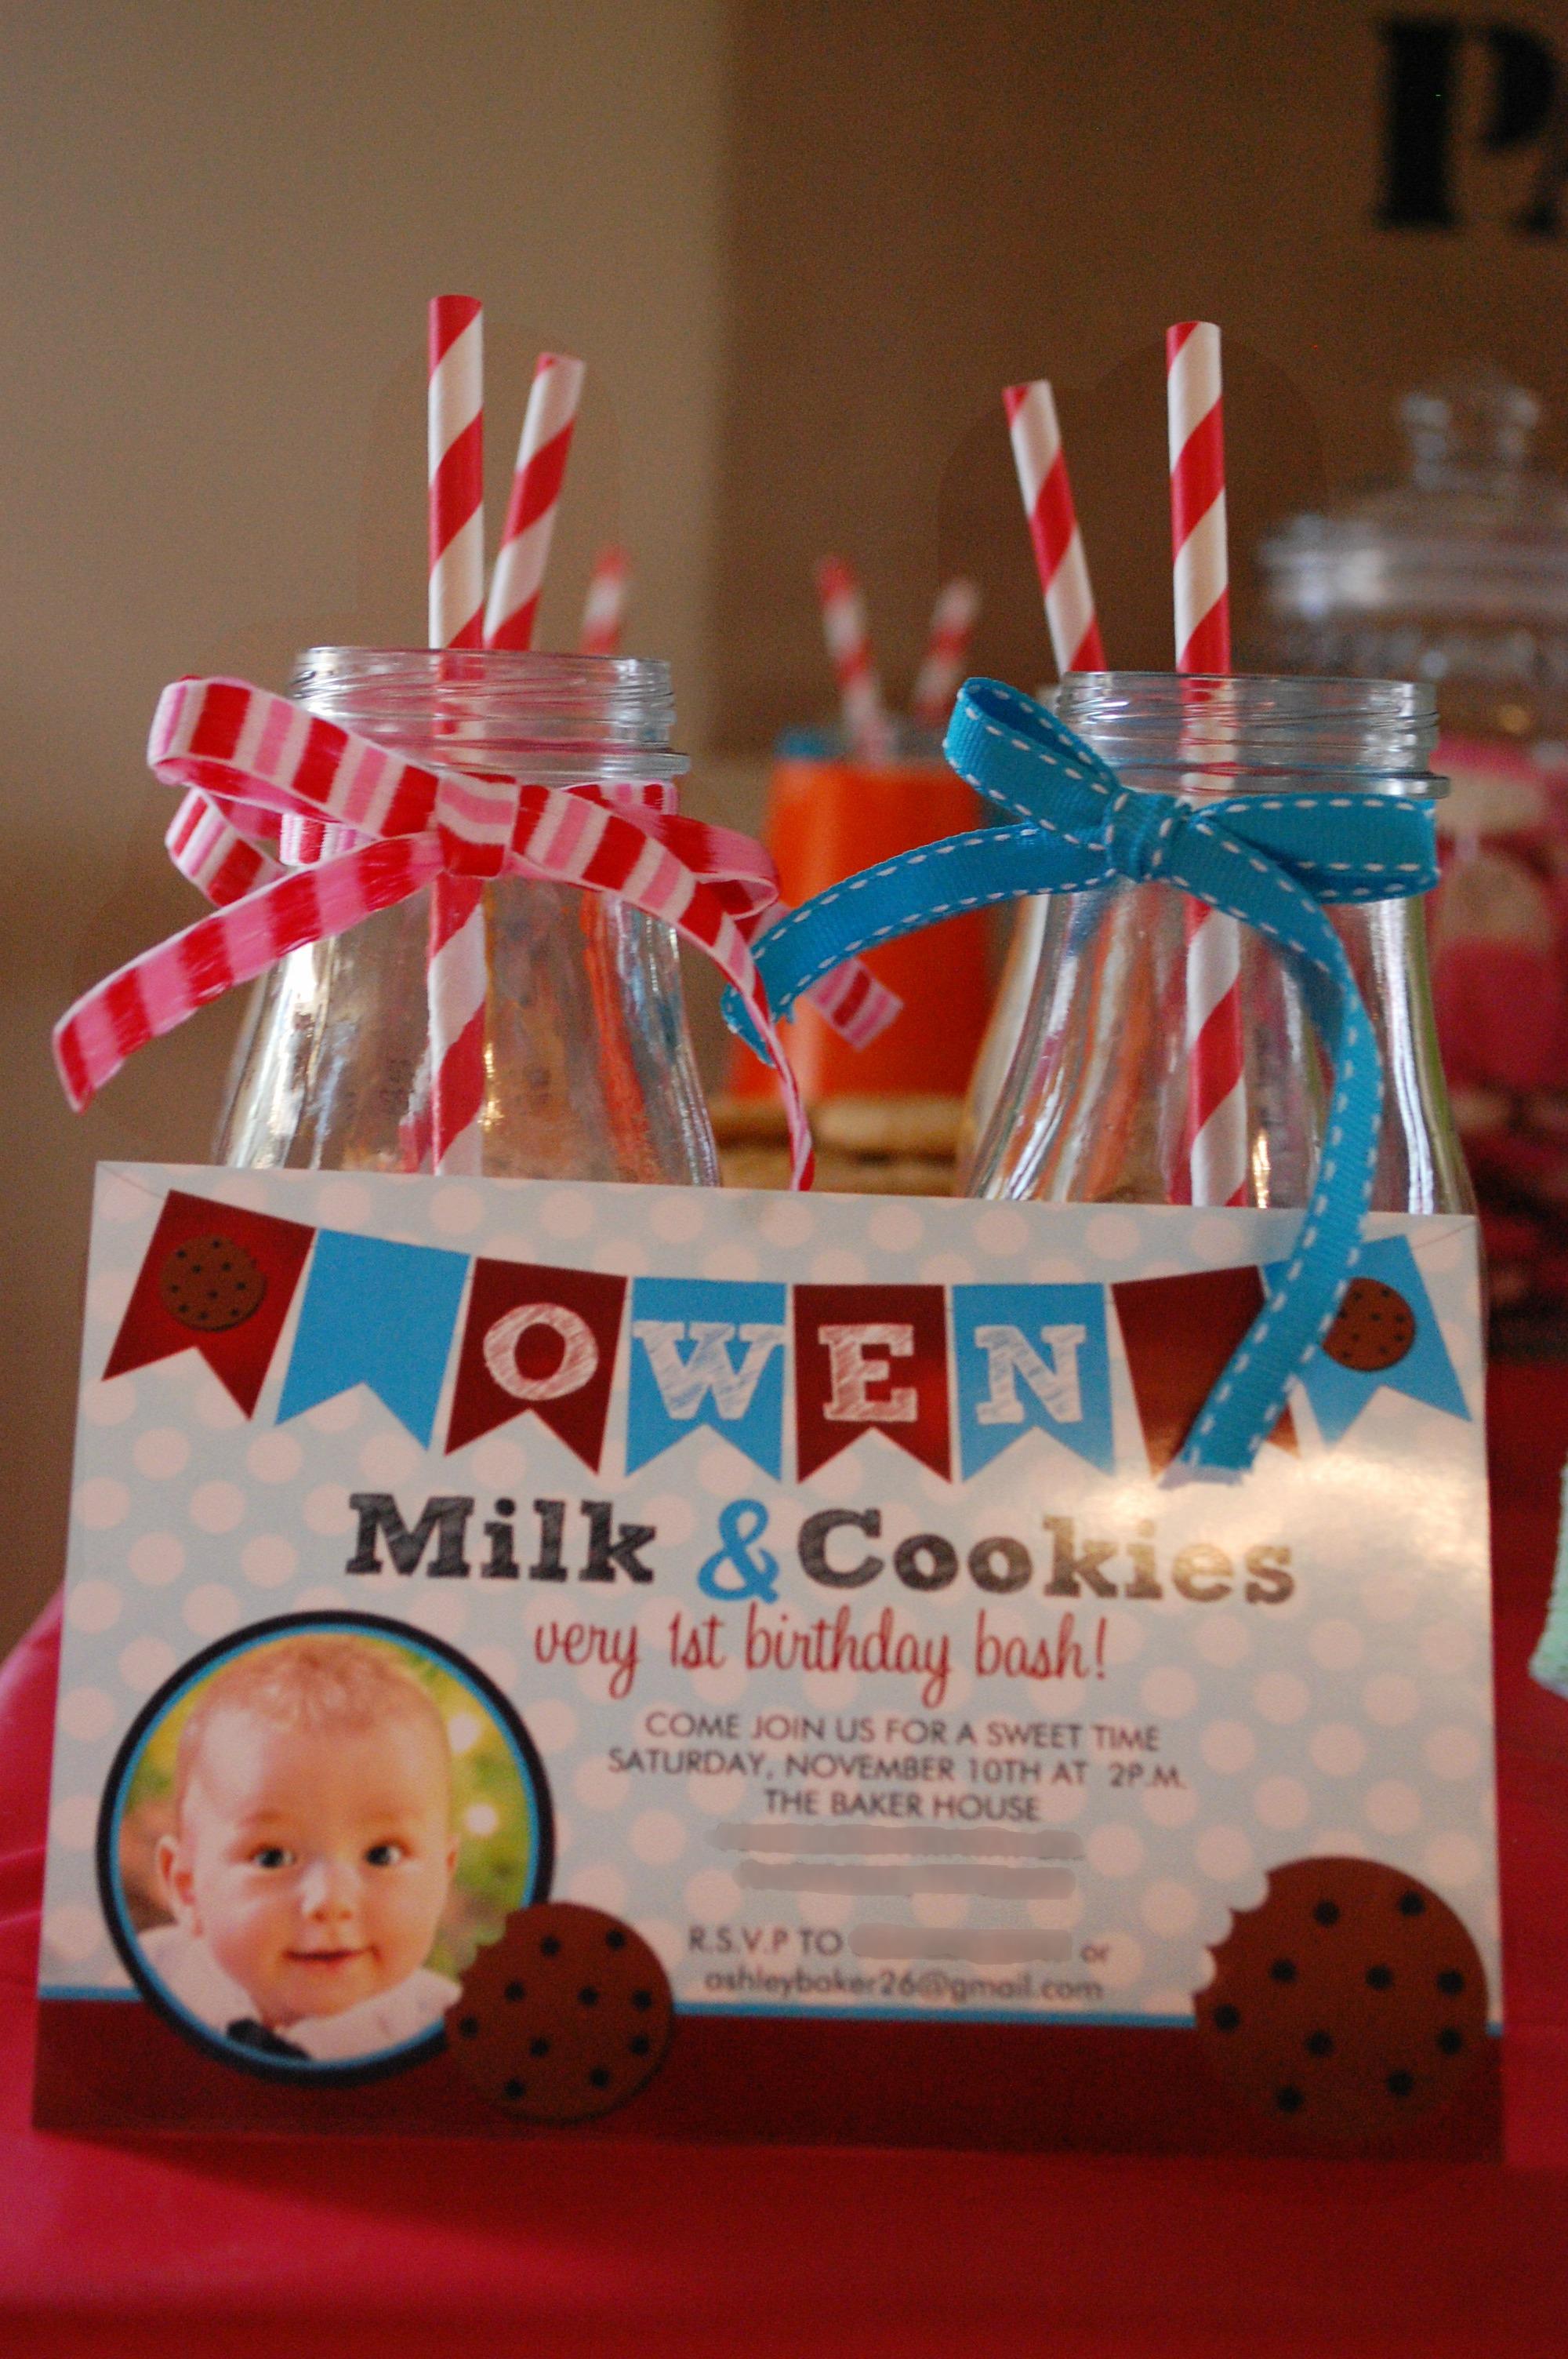 Owen S Cookies And Milk Party